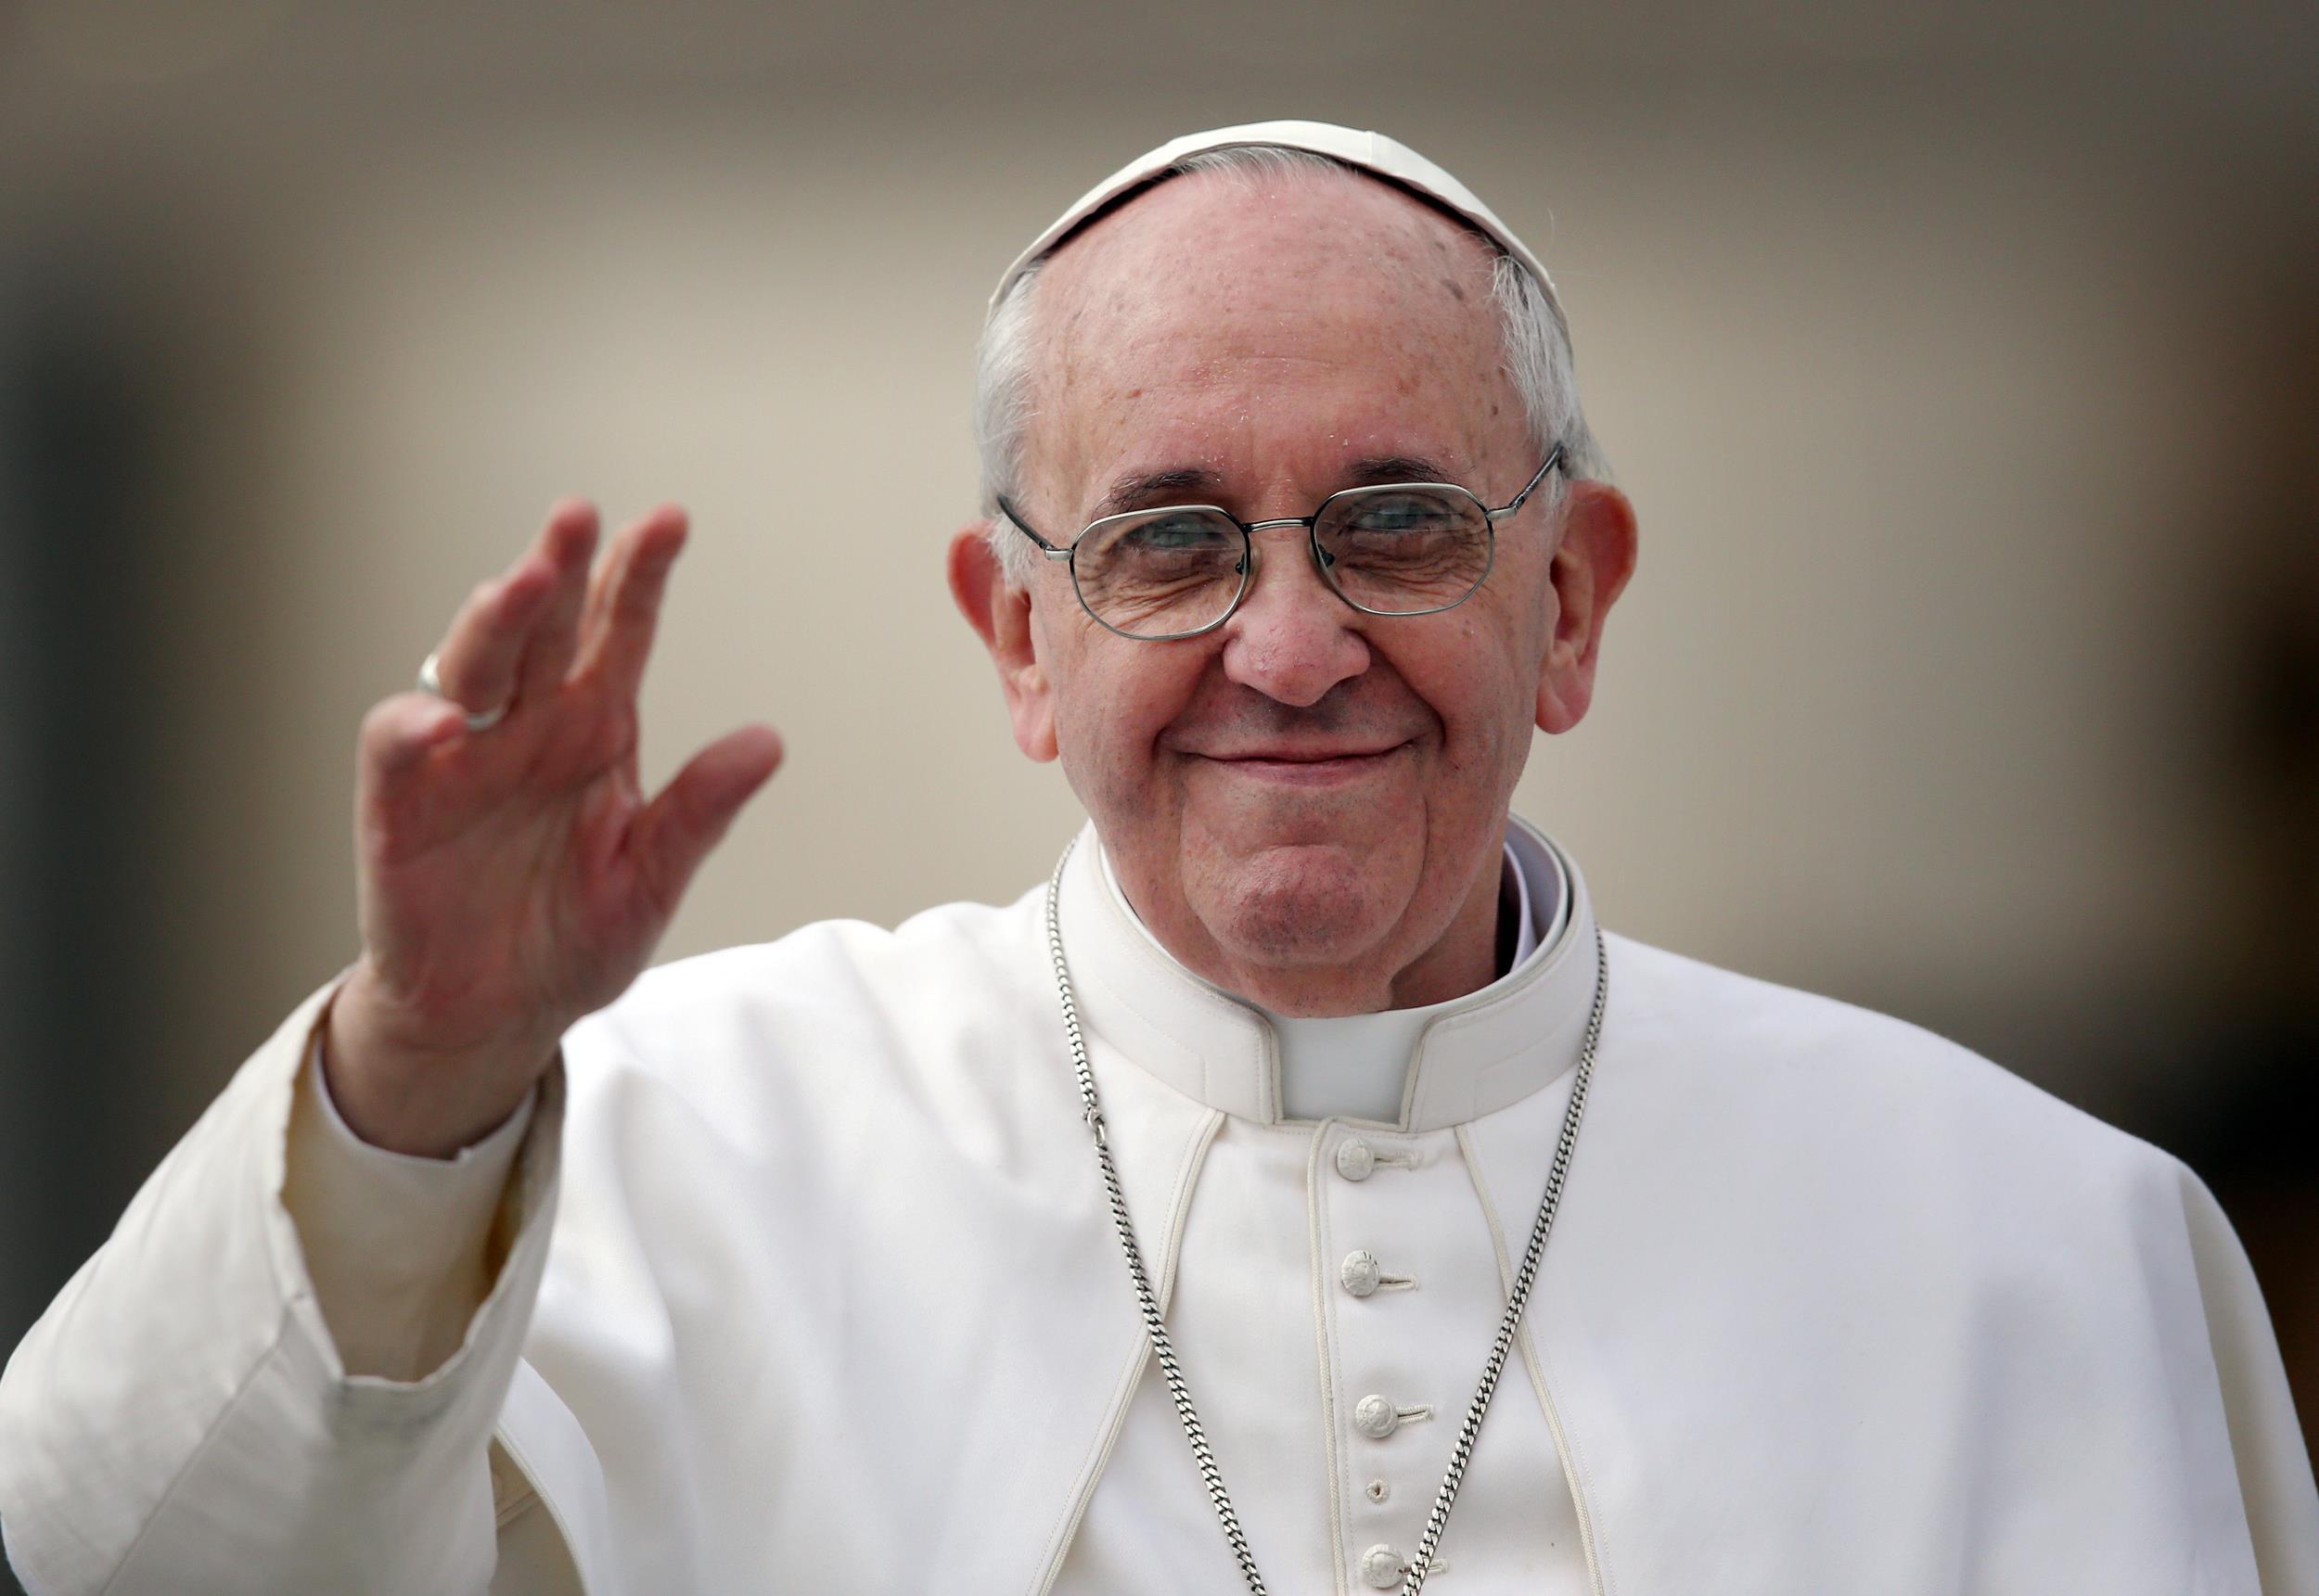 140527-pope-francis-930a_7c376809e99a01f79b0787e1a223e8d0